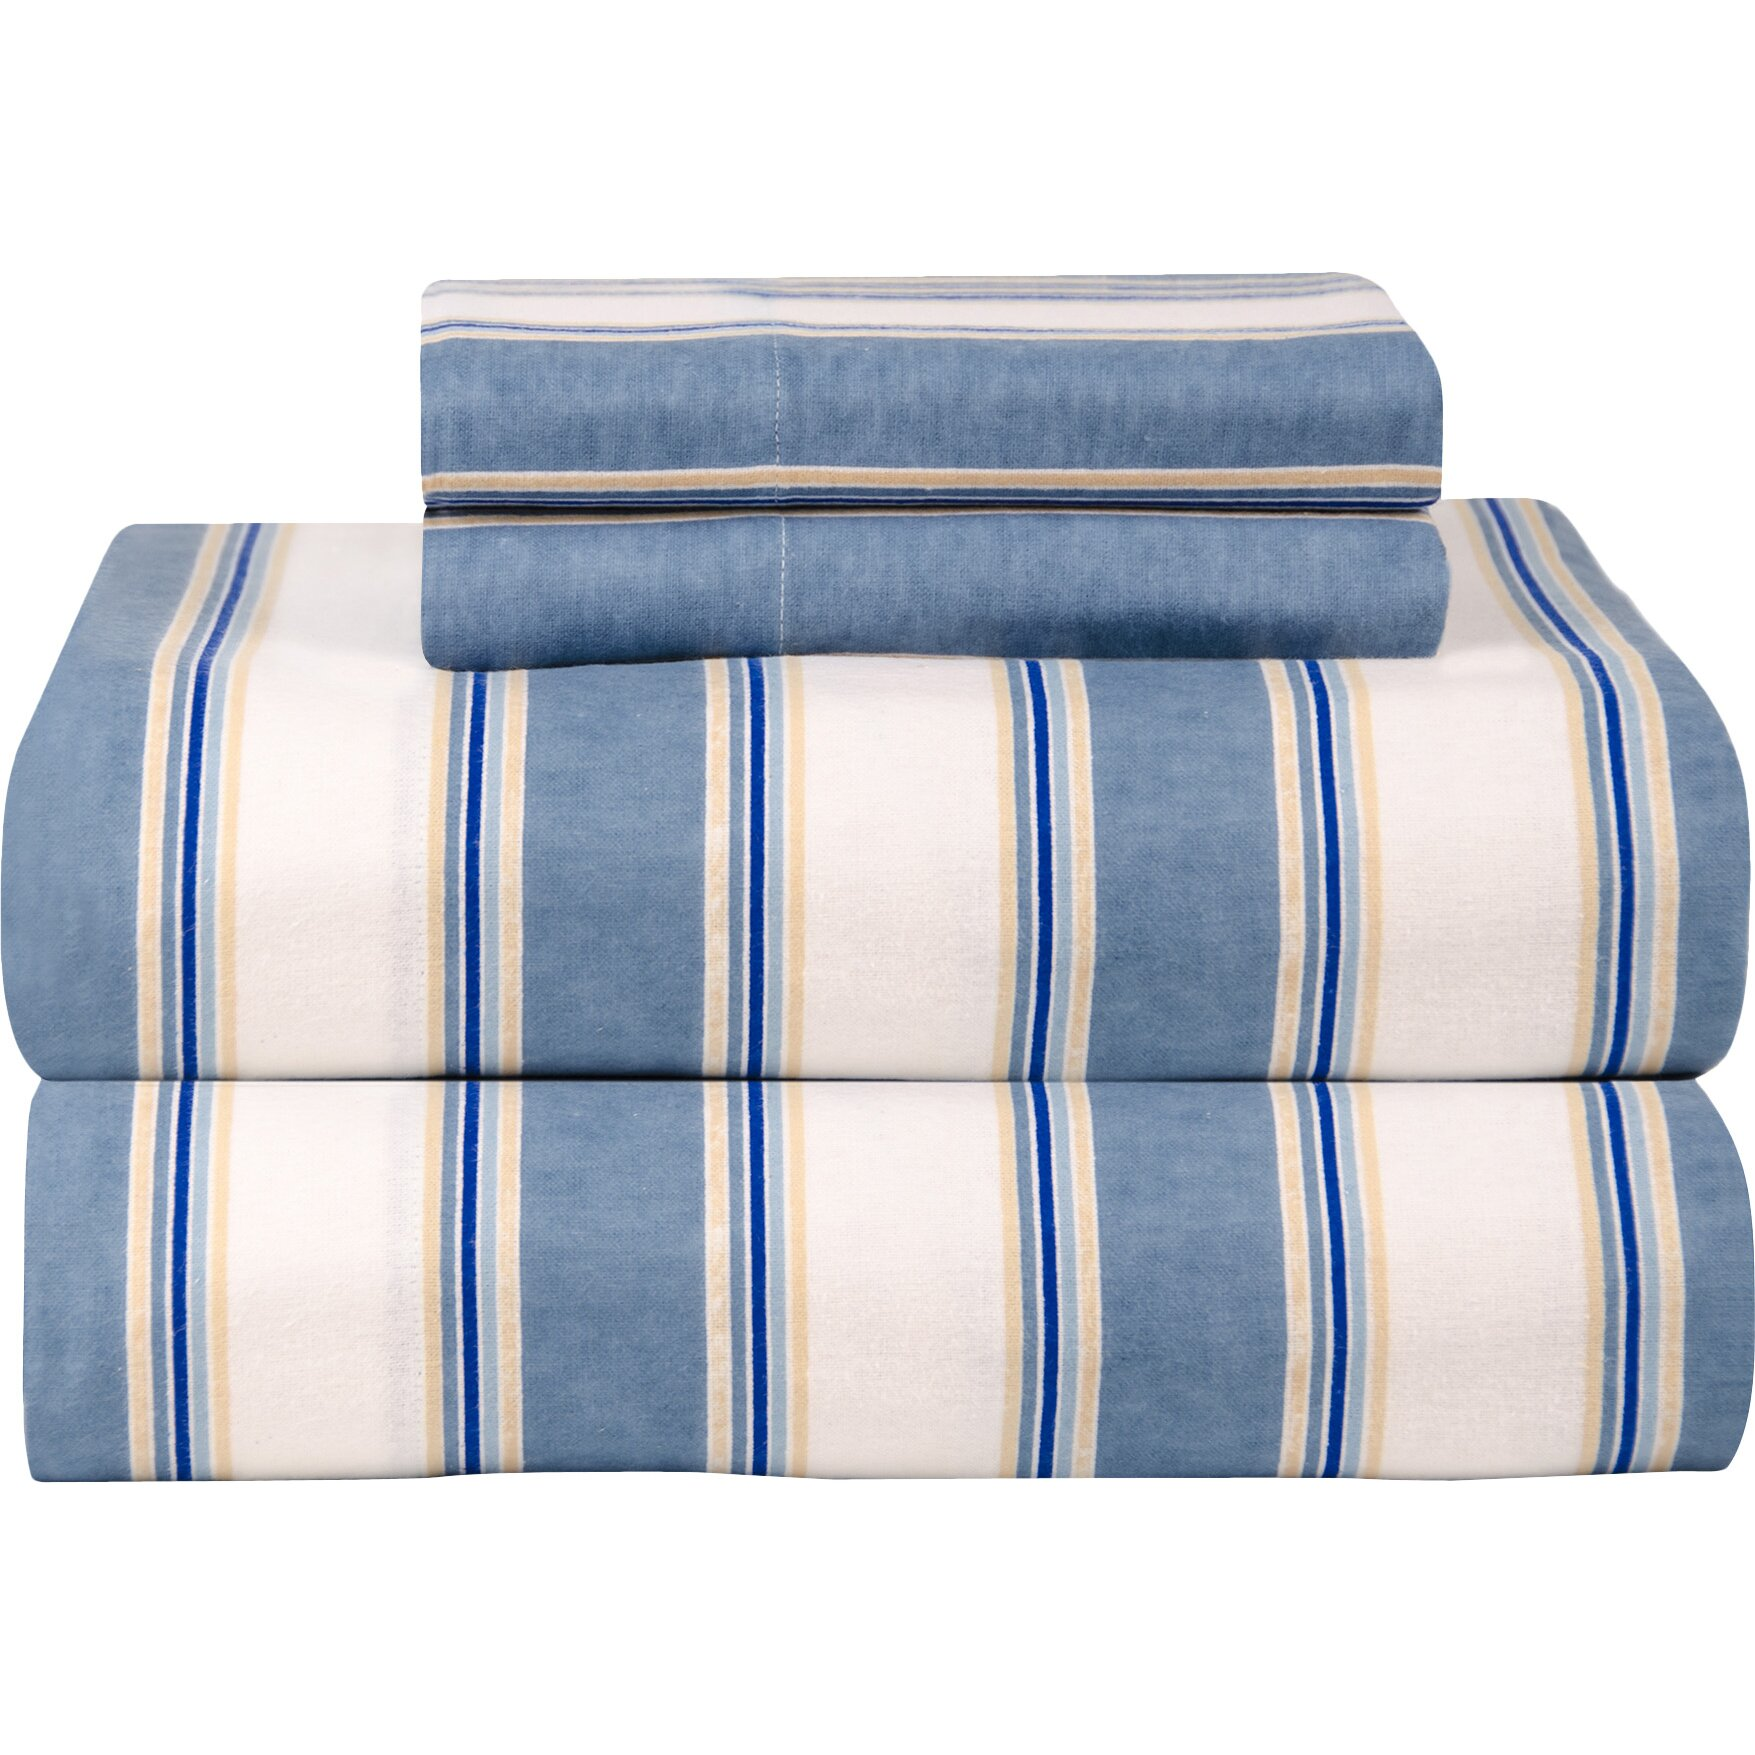 Celeste Home Celeste Home Ultra Soft Flannel Sheet Set In